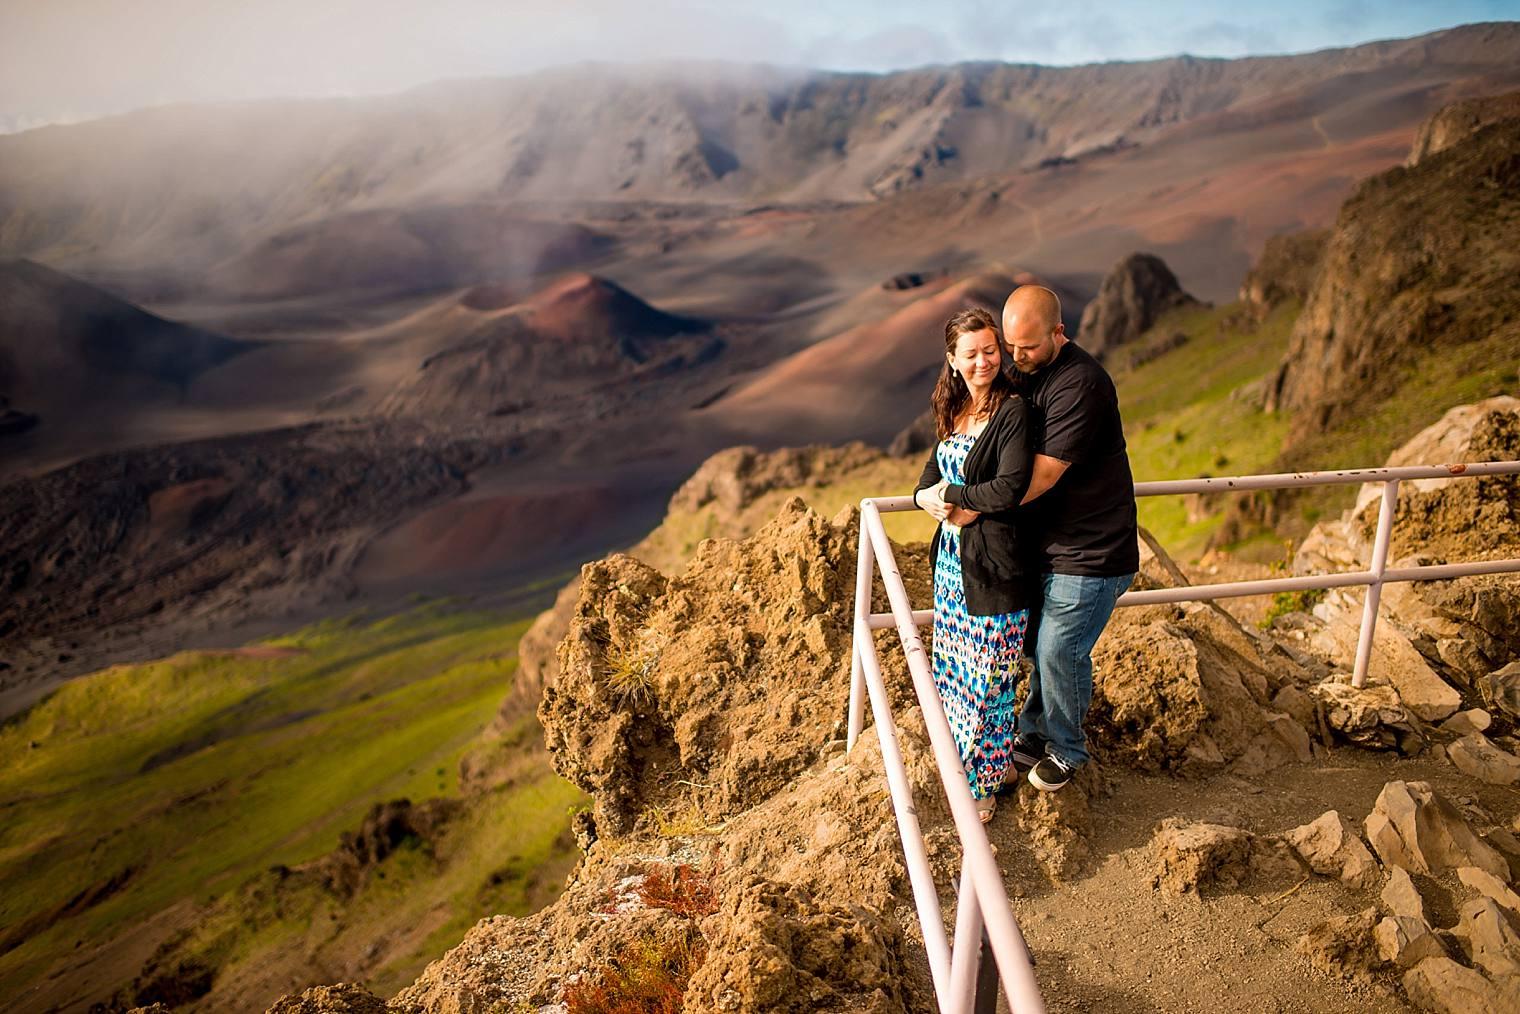 Haleakala's crater